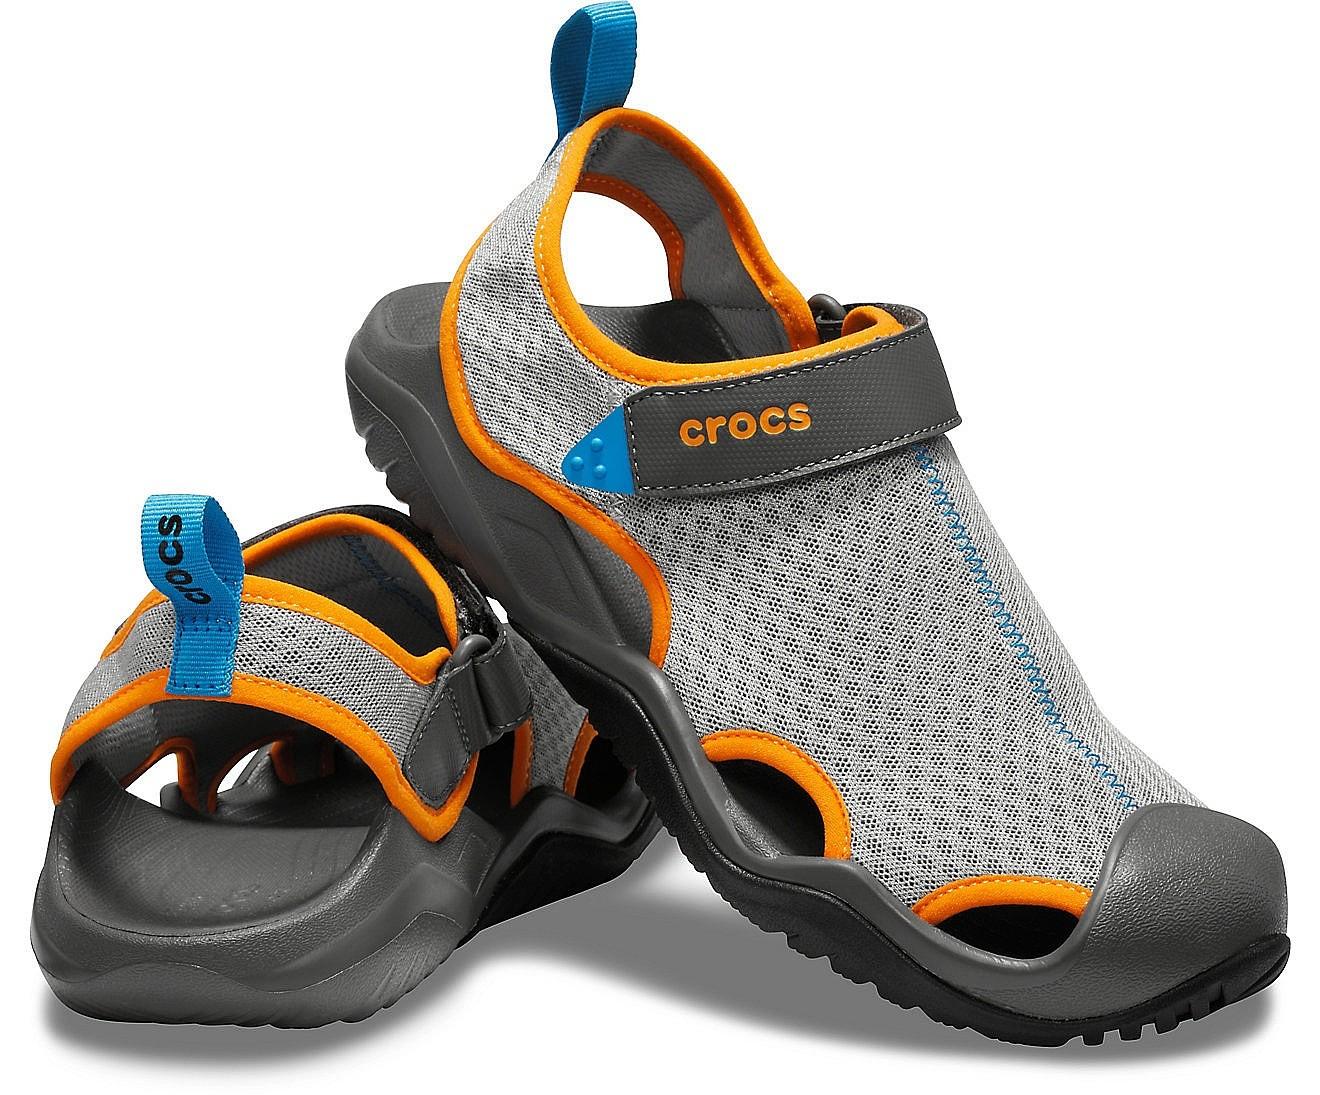 Crocs Mens Swiftwater Mesh Deck Sandal Sport